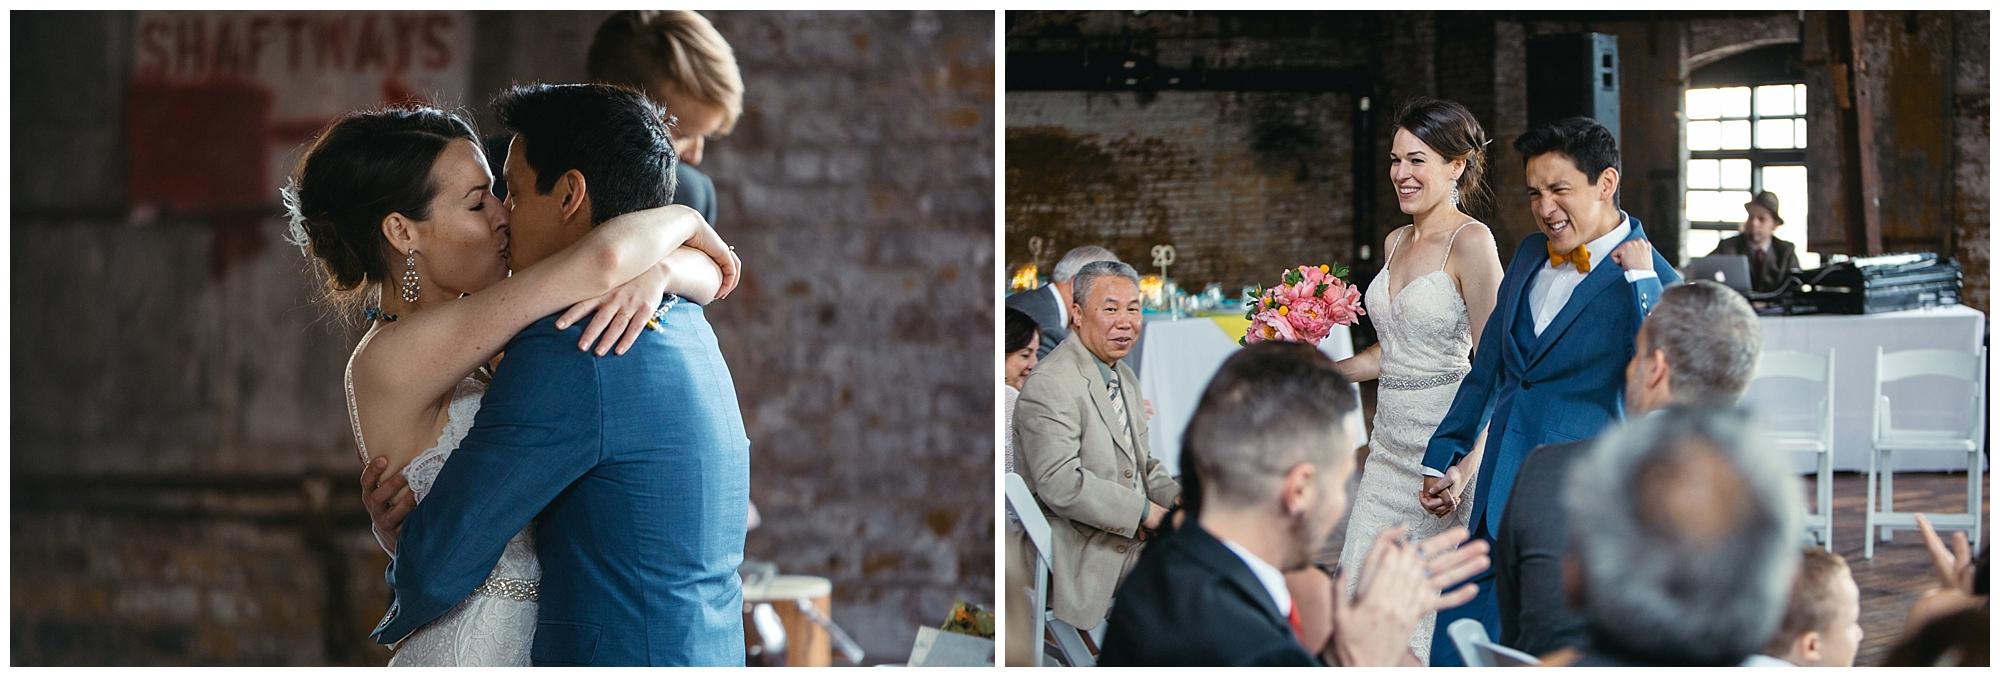 NYC-Wedding-Photographer20.jpg